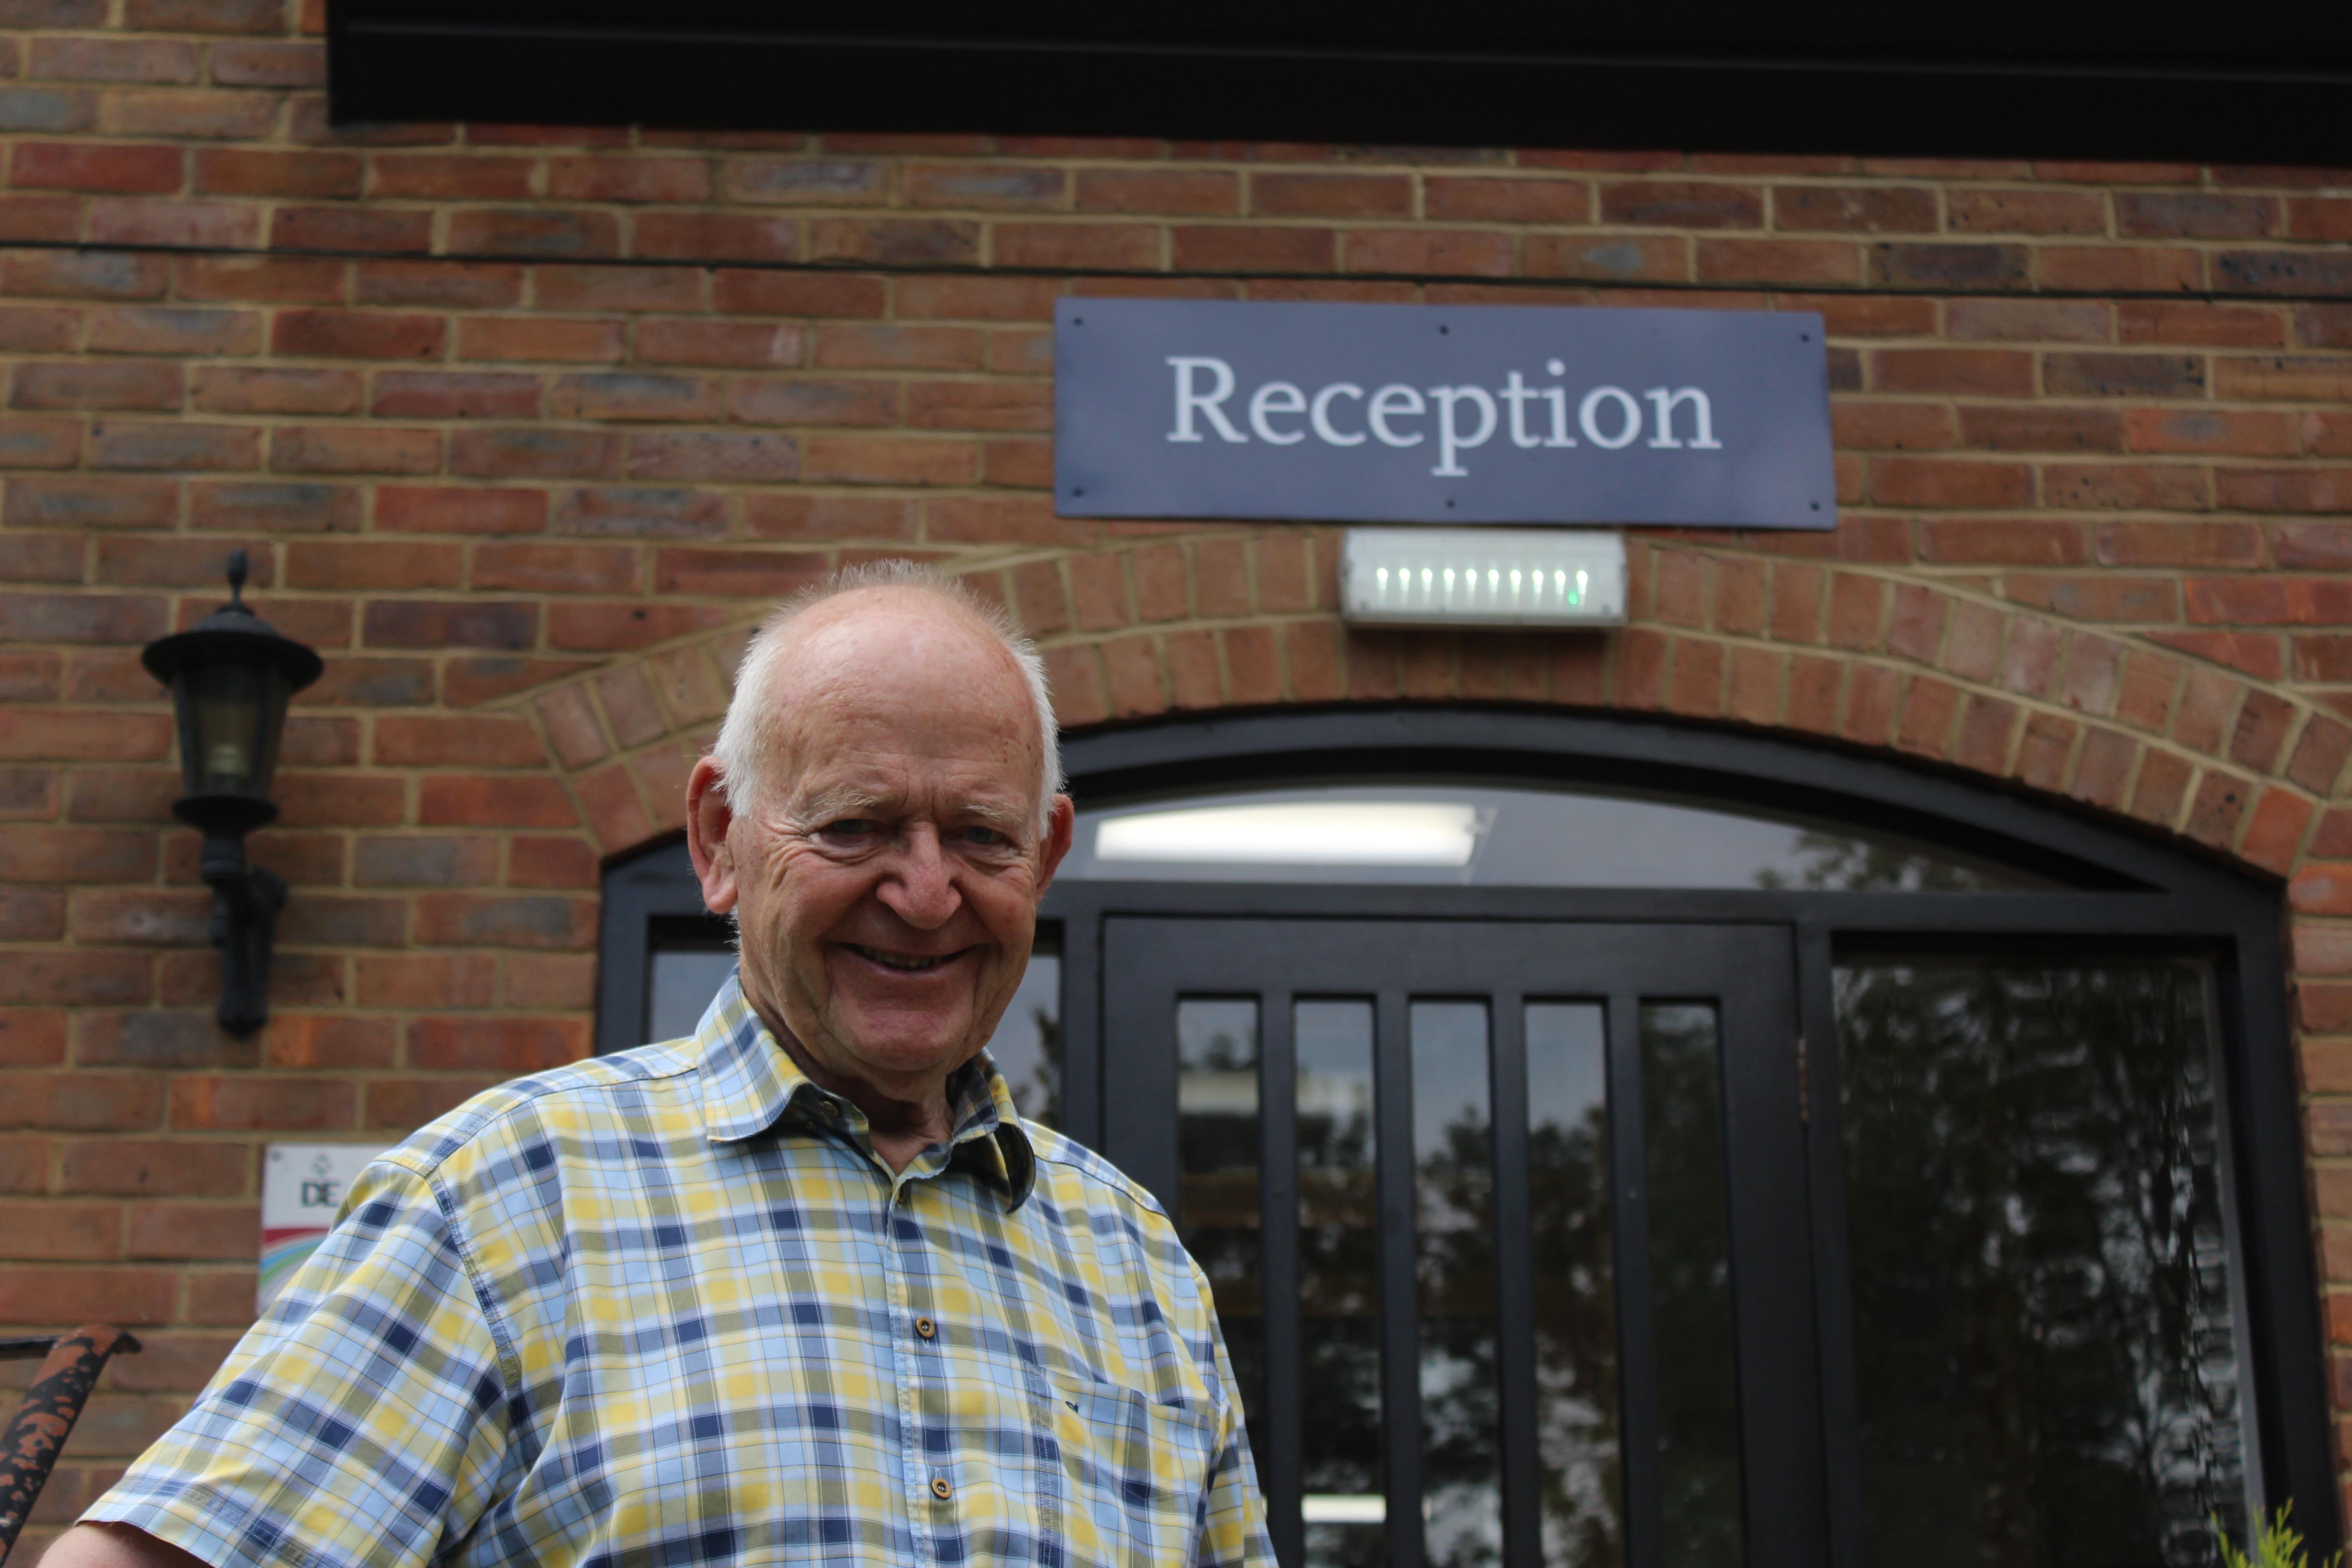 Former pupil, Brendan Parke, visited Bethany for some memories